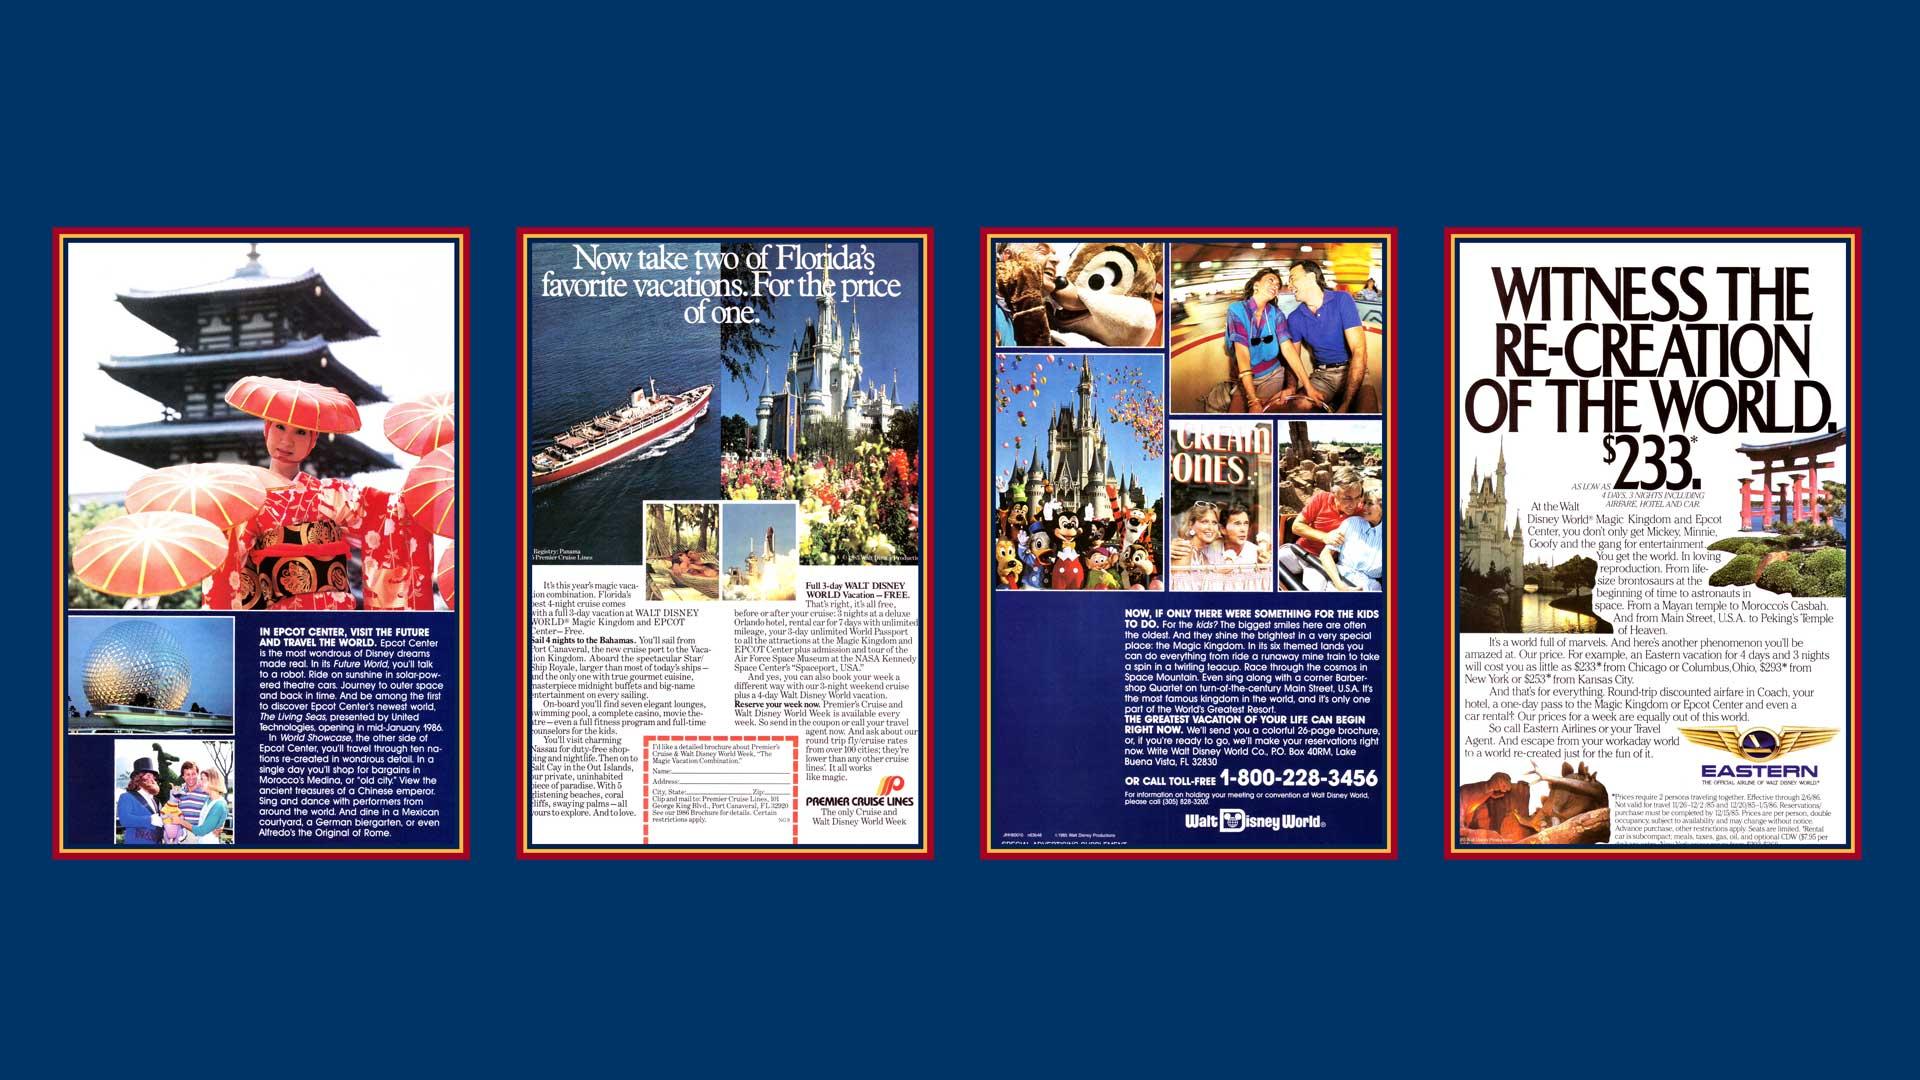 Premier Cruise Lines Walt Disney World 1985 Advertisement